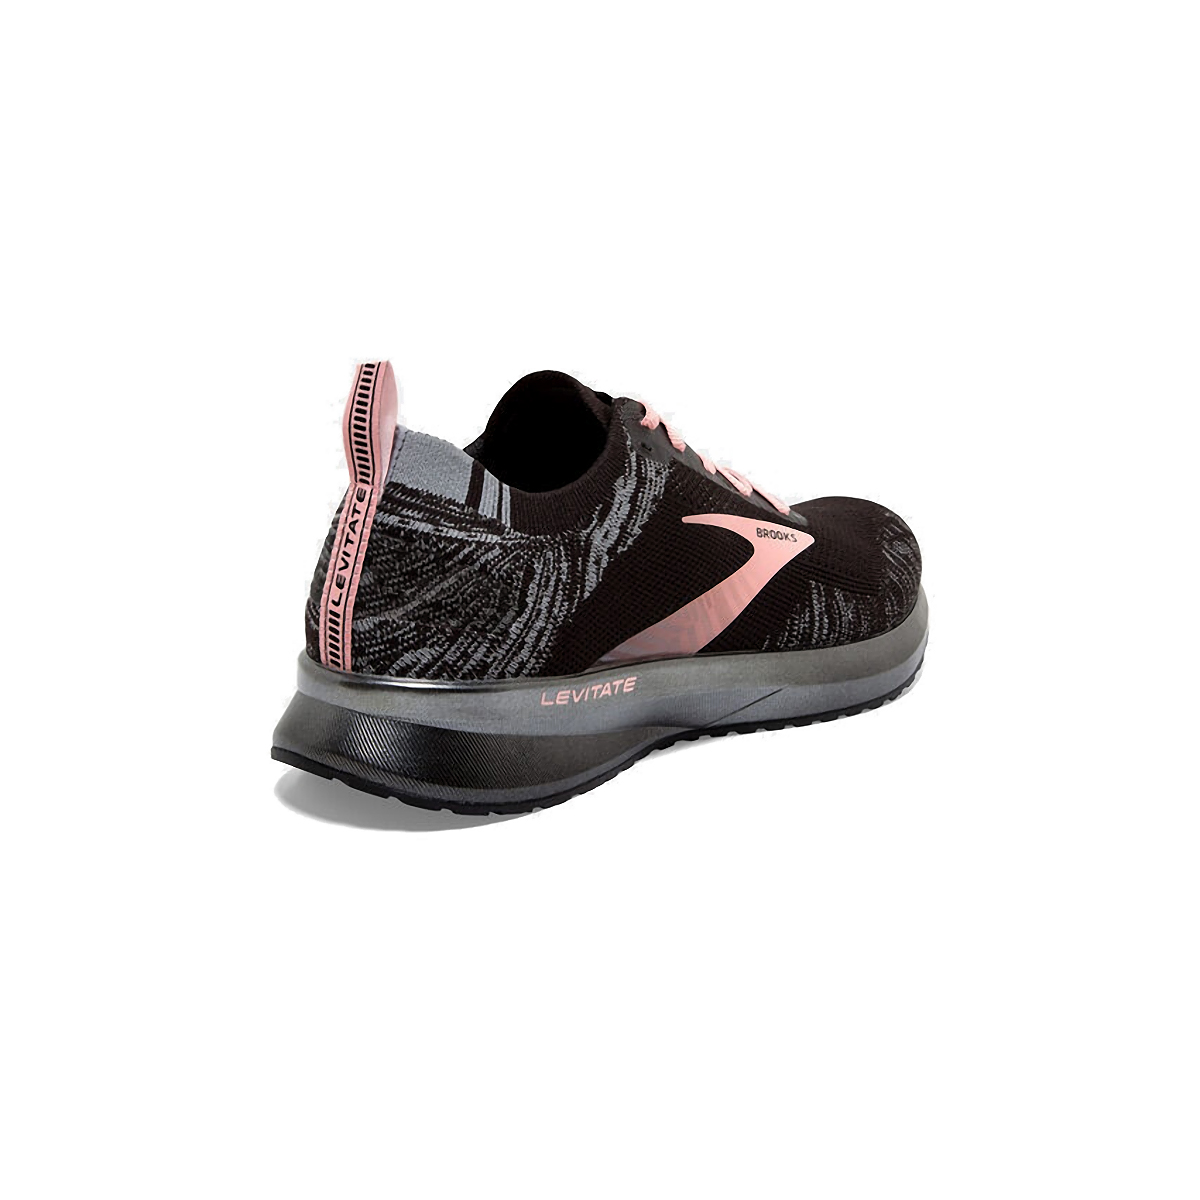 Women's Brooks Levitate 4 Running Shoe - Color: Black/Grey/Coral - Size: 5 - Width: Regular, Black/Grey/Coral, large, image 4